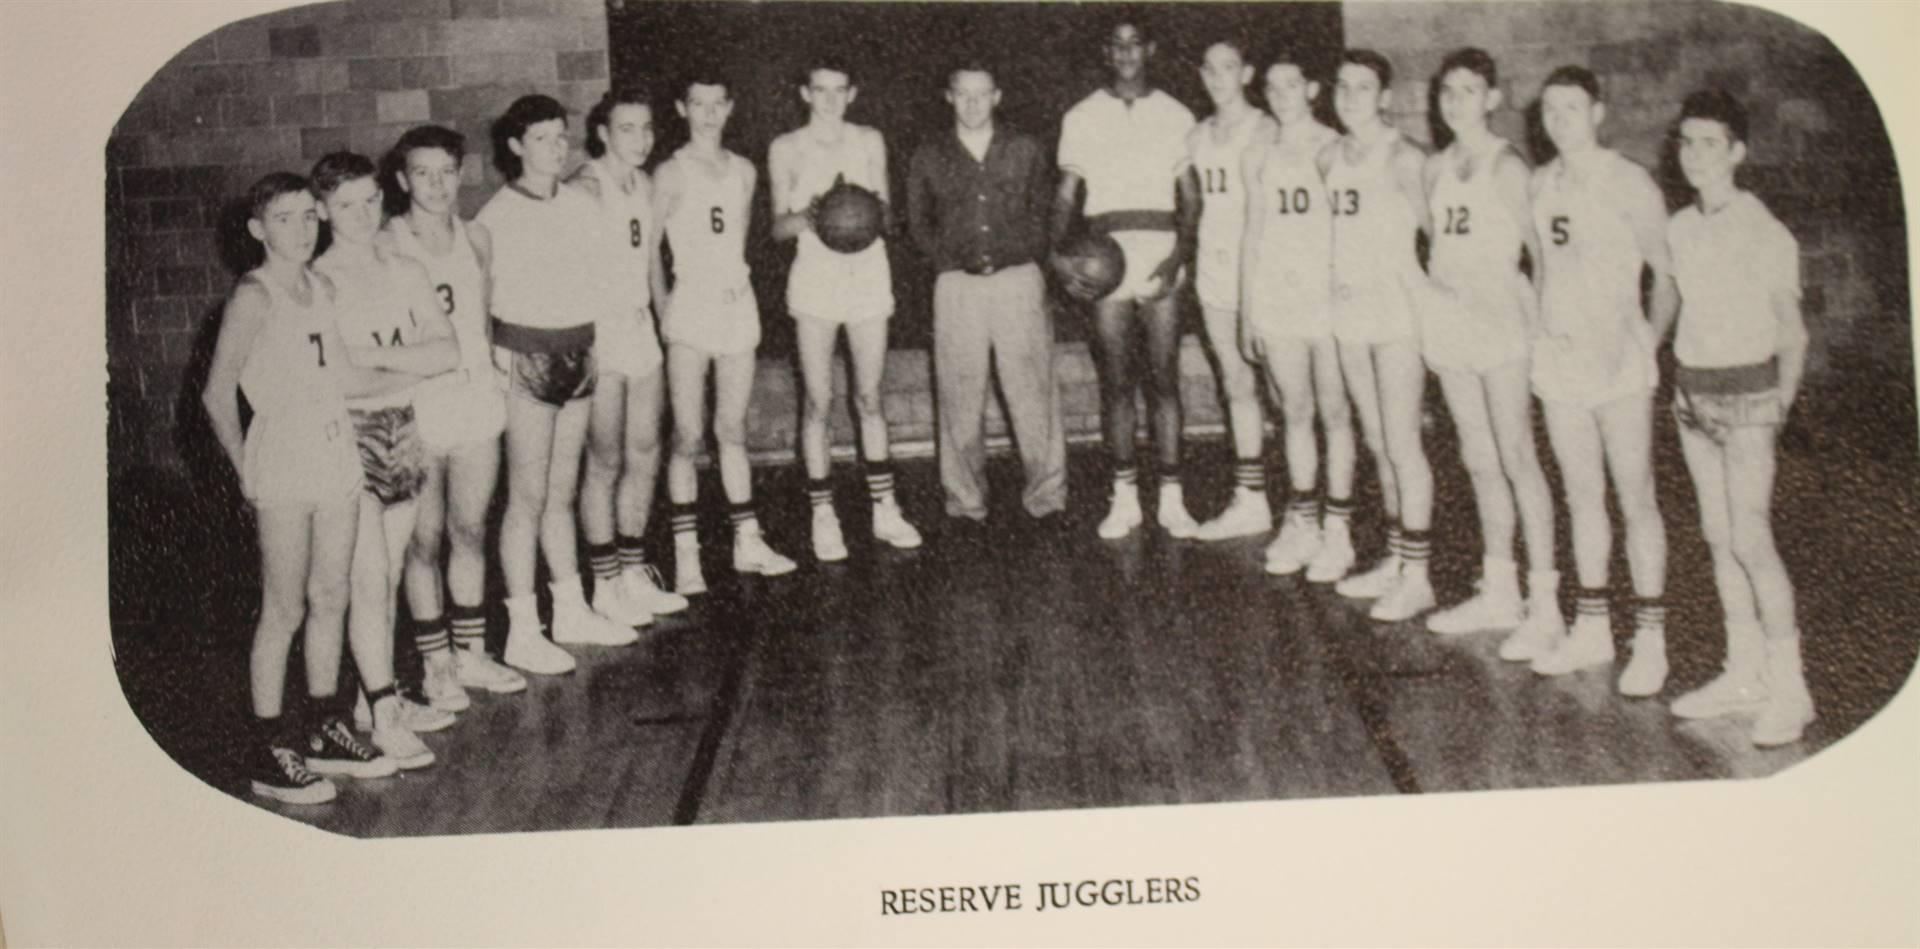 1955 Reserve Jugglers